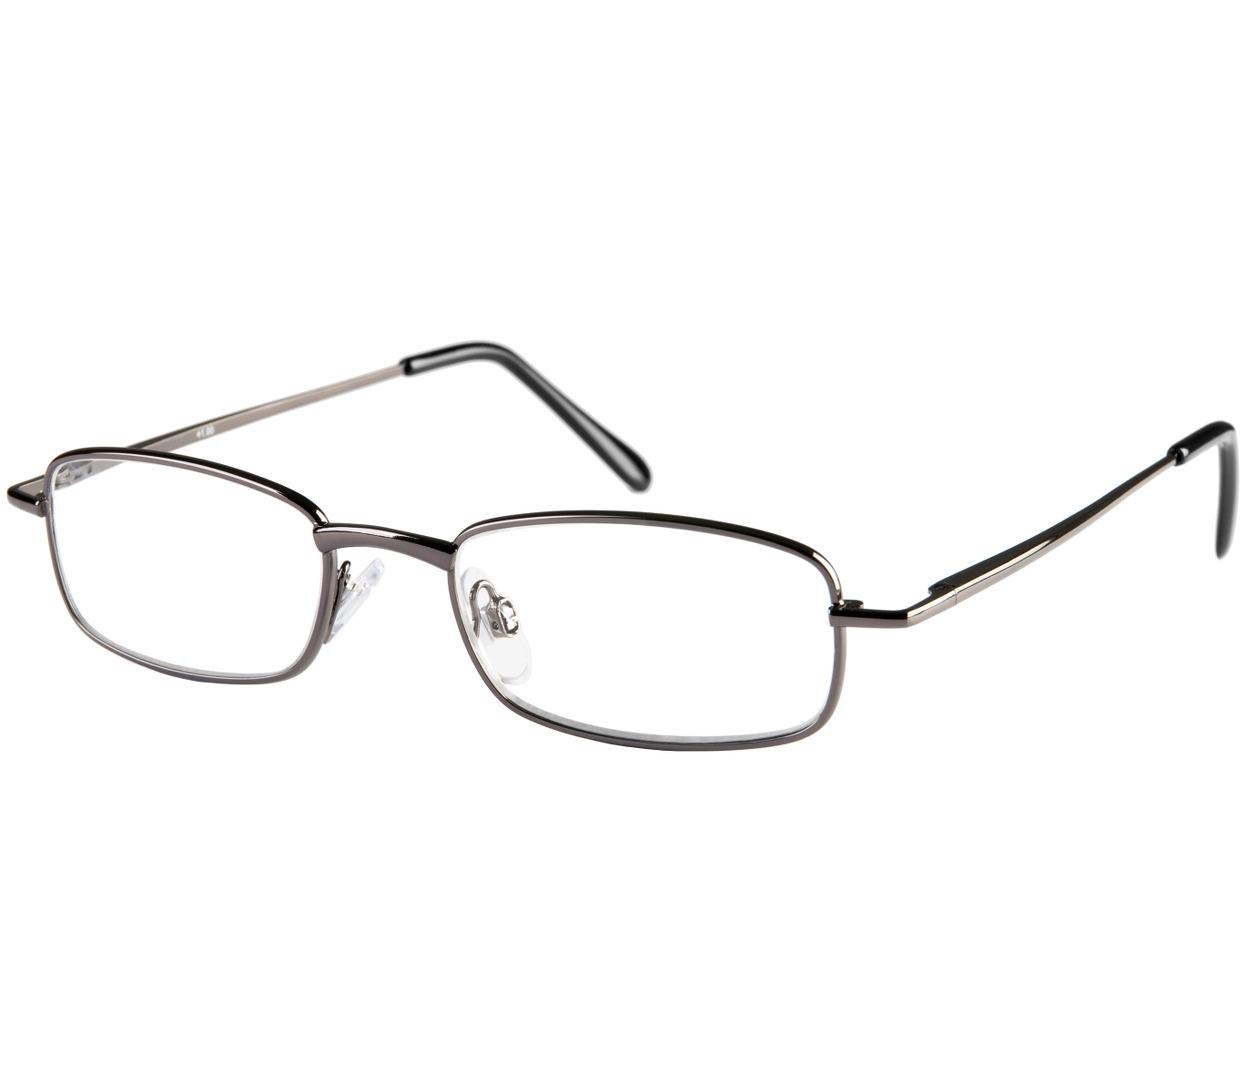 Main Image (Angle) - Shuffle (Gunmetal) Classic Reading Glasses